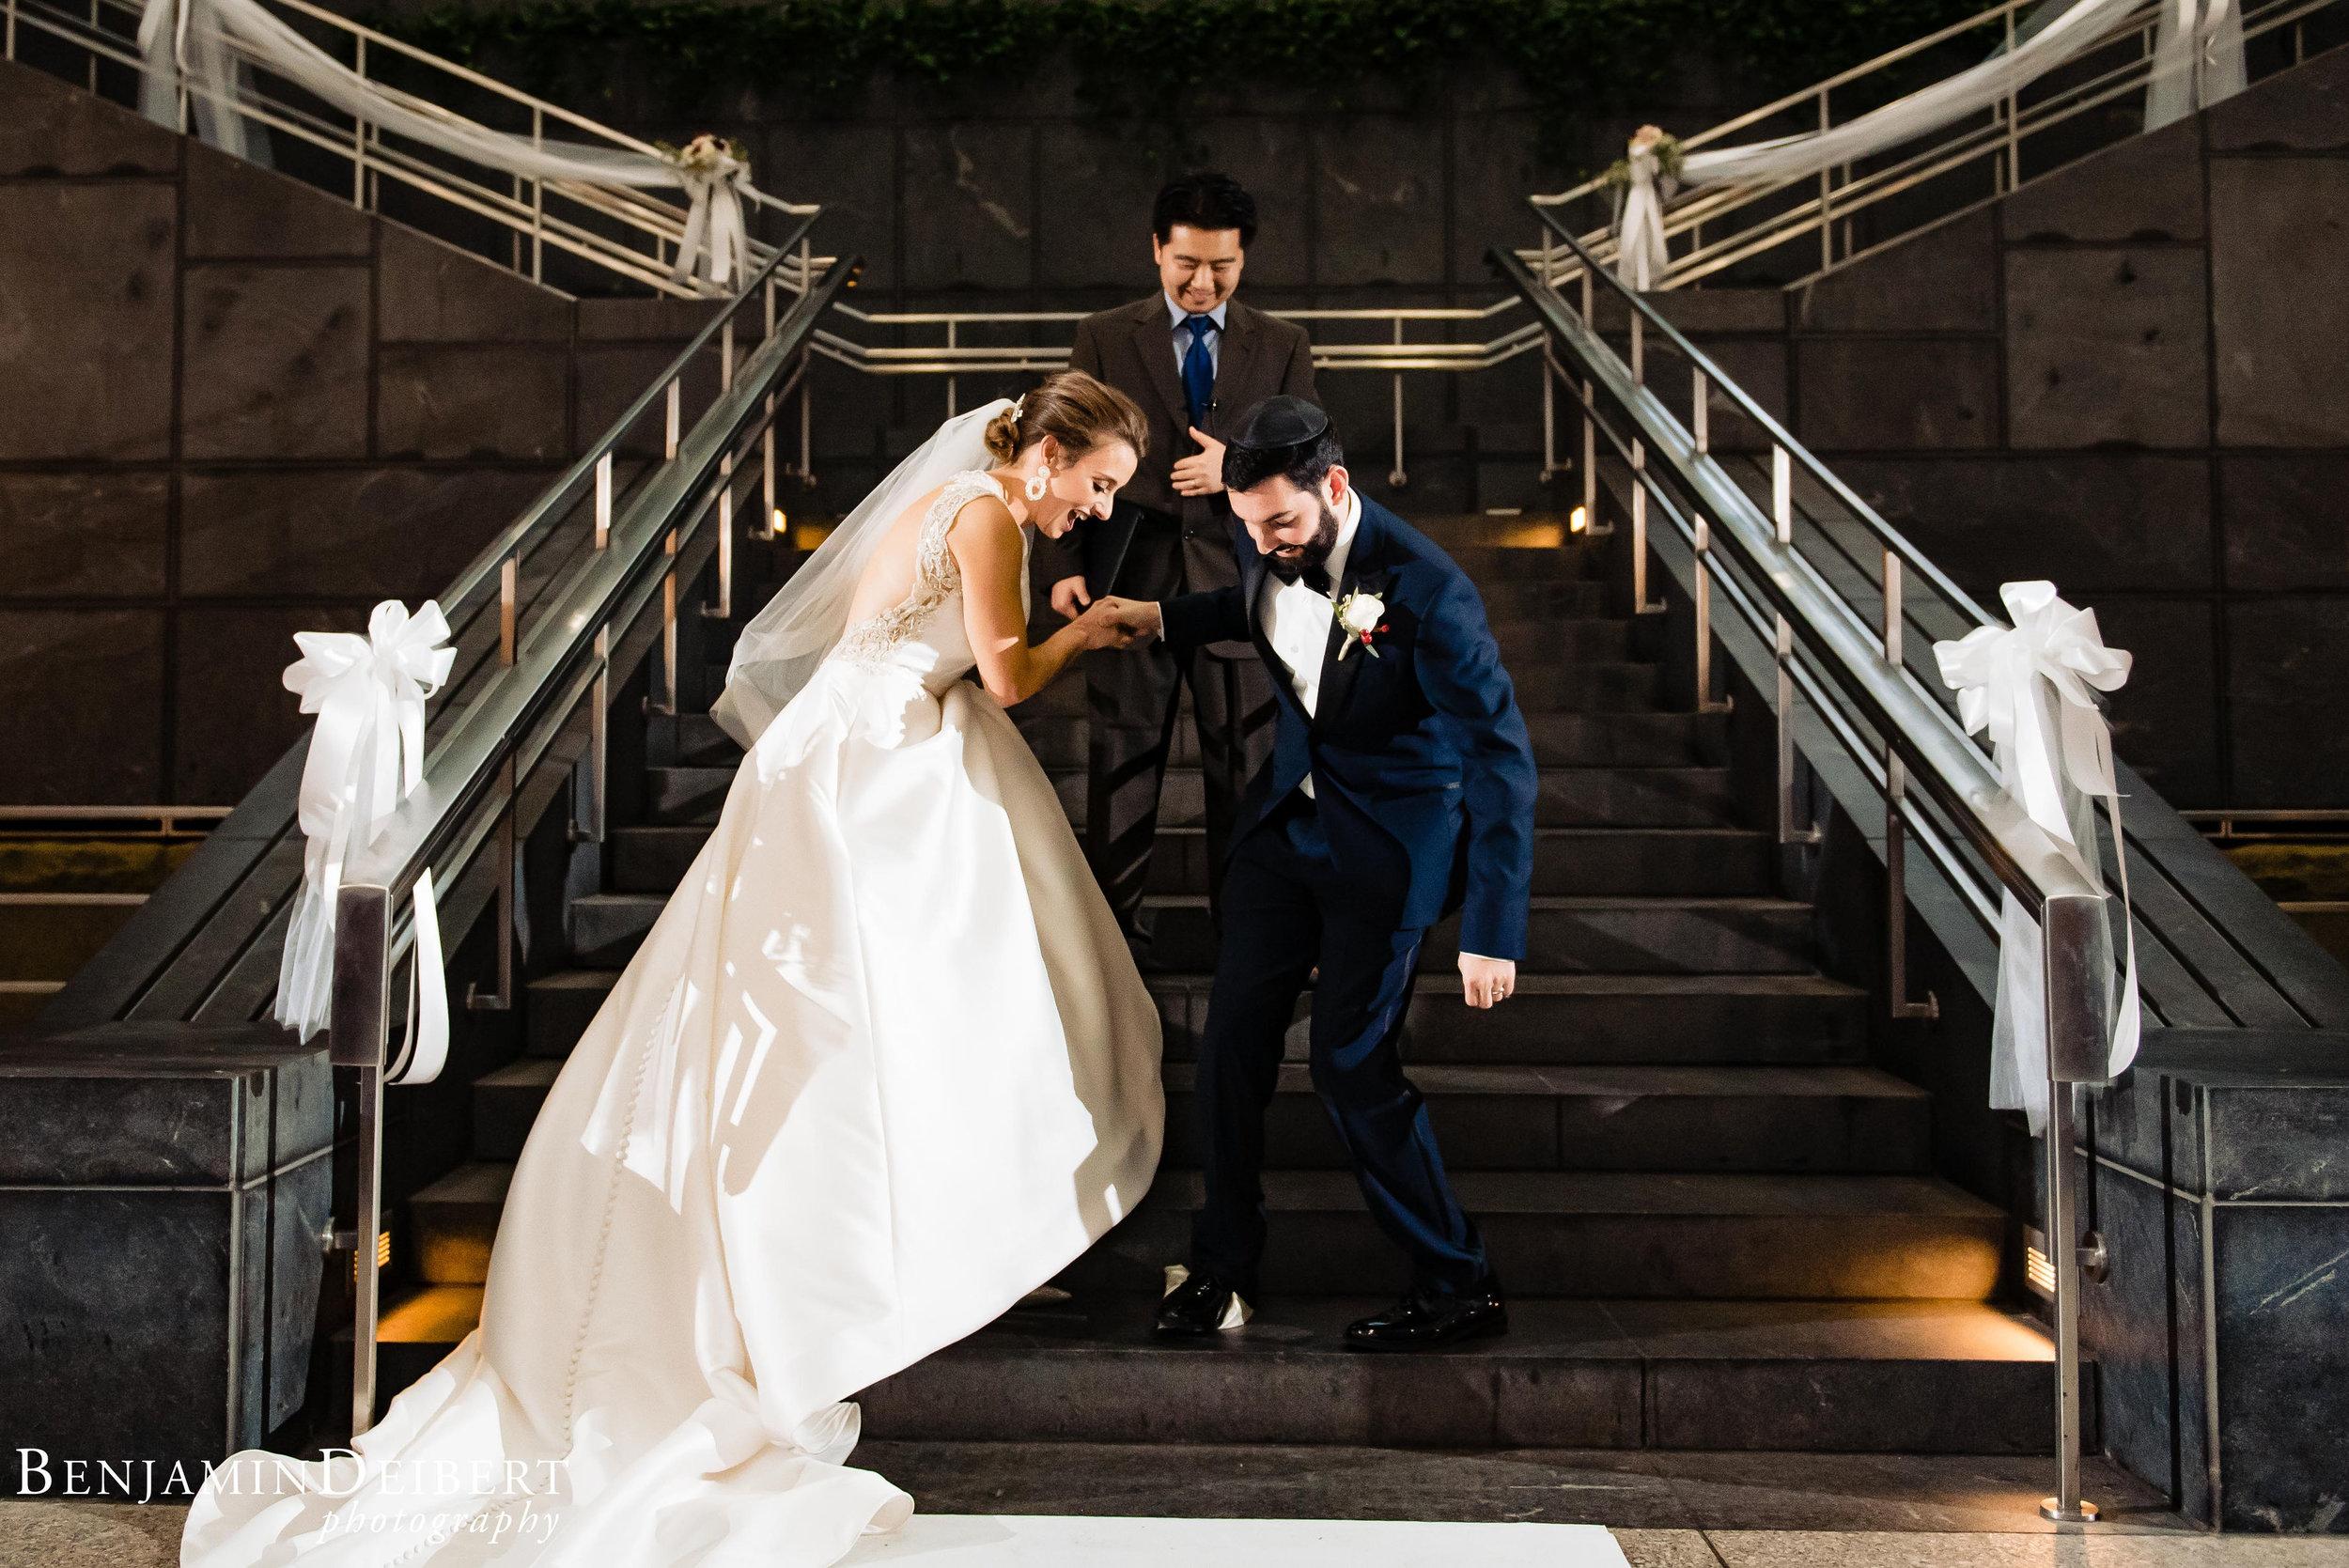 CatherineandDaniel_ThePyramidClub_Wedding-52.jpg